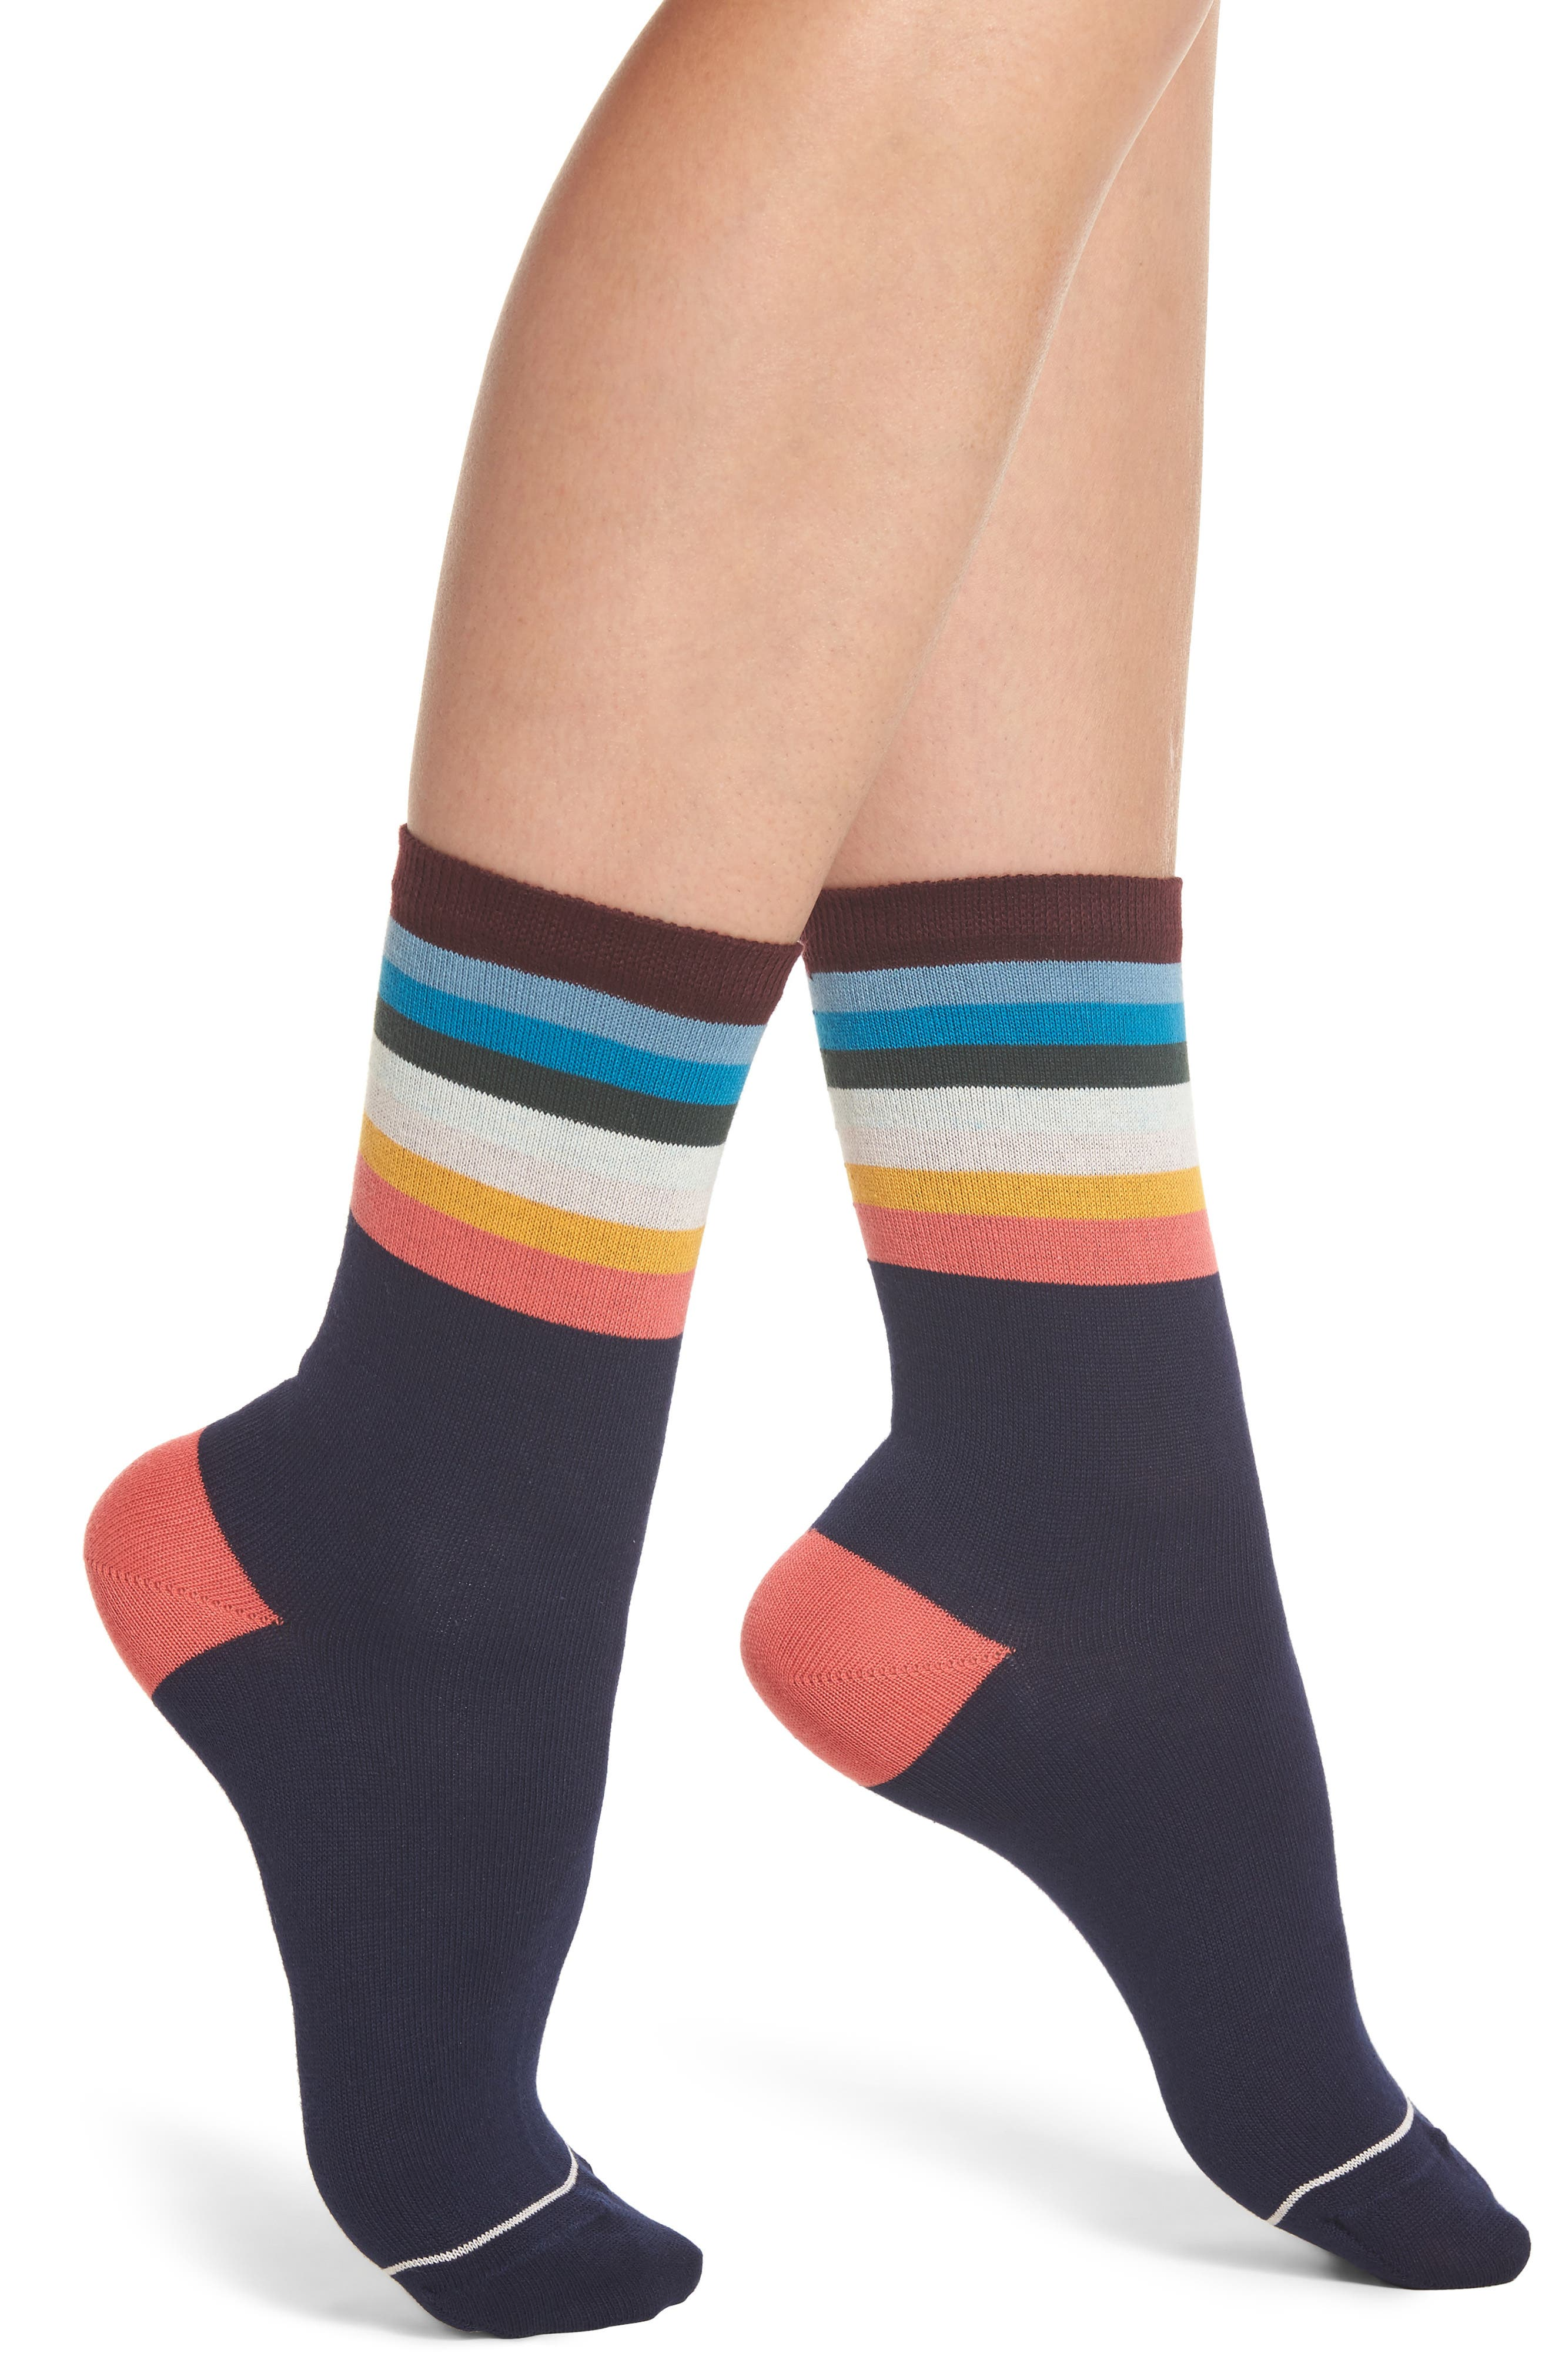 Cindy Artist Stripe Ankle Socks,                         Main,                         color, Navy